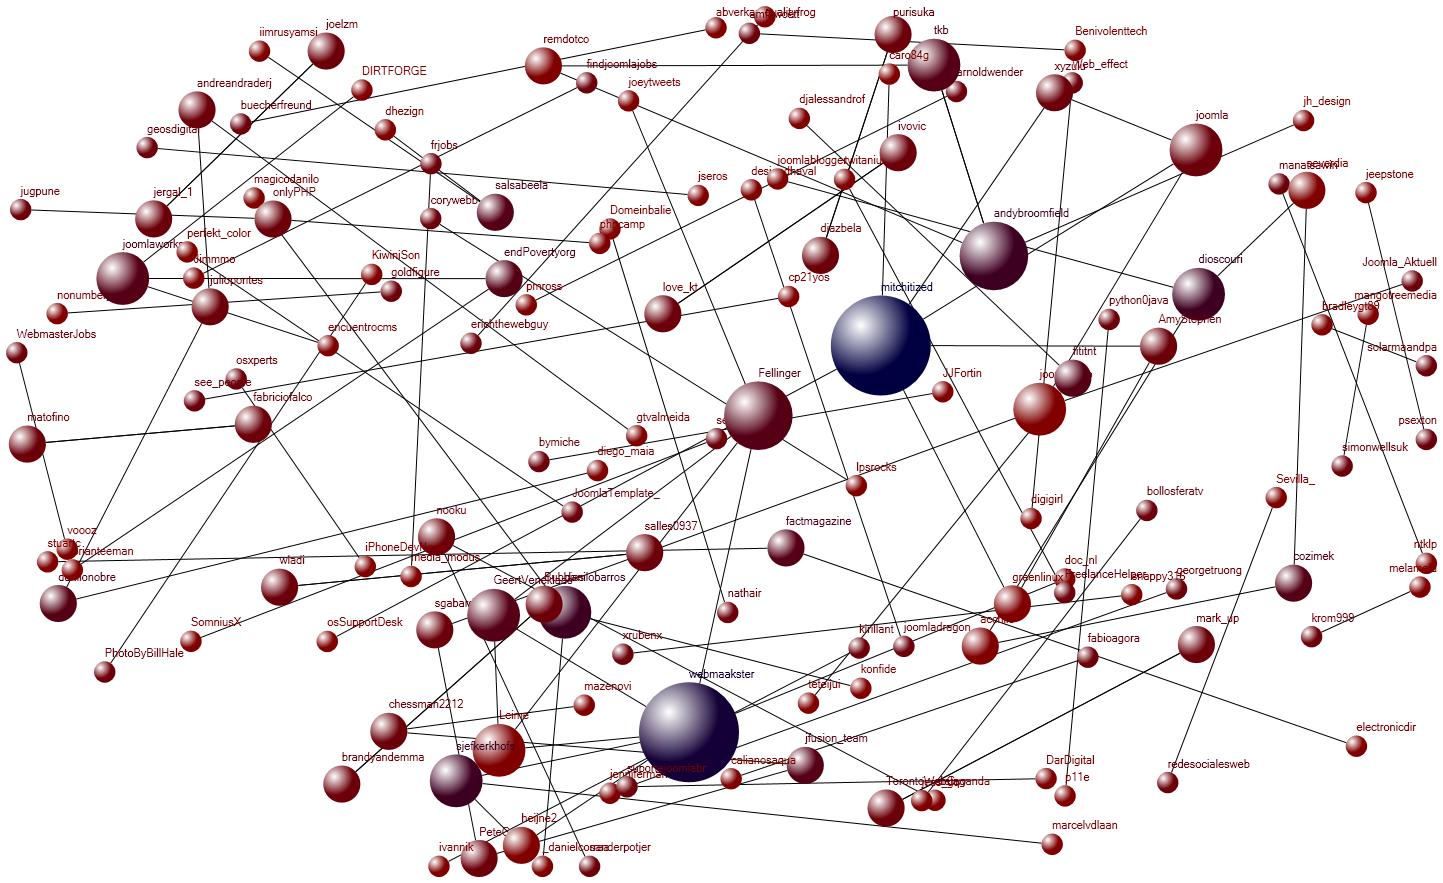 Nodexl social network visualization example 5